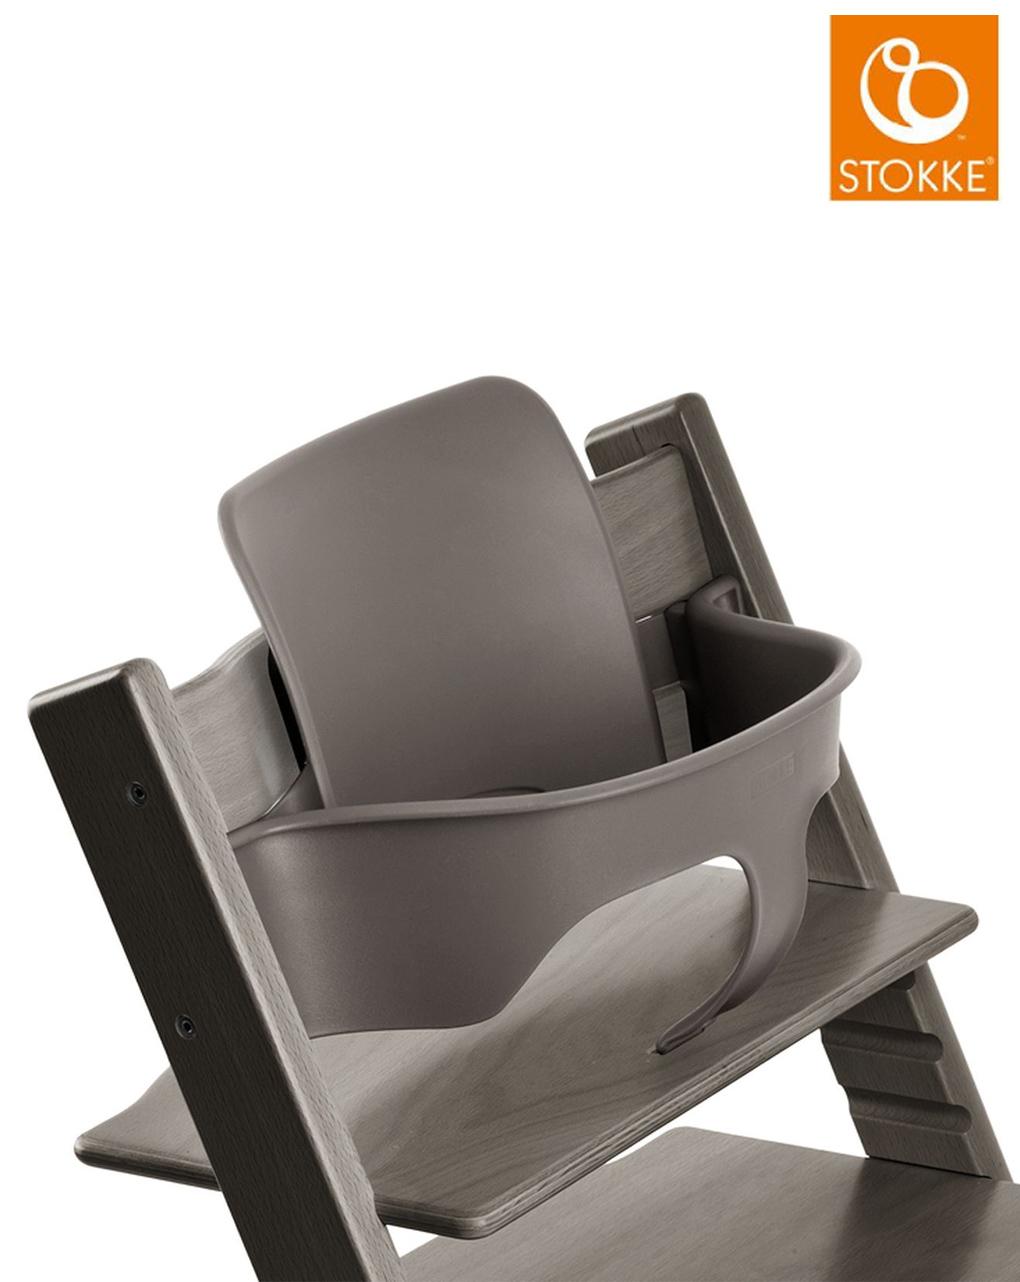 Stokke® baby set per tripp trapp® - hazy grey - Stokke